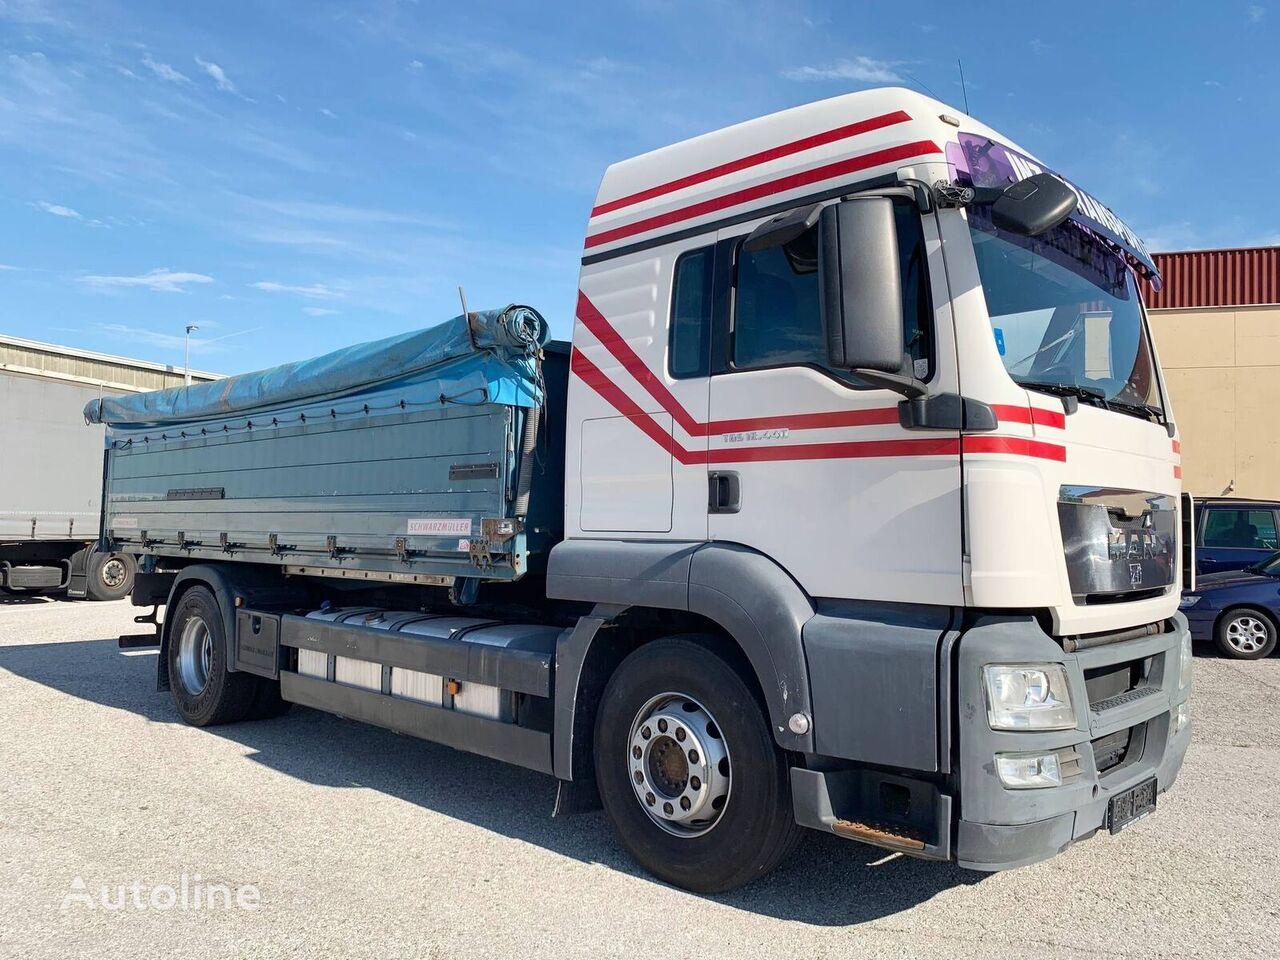 MAN 18 grain truck